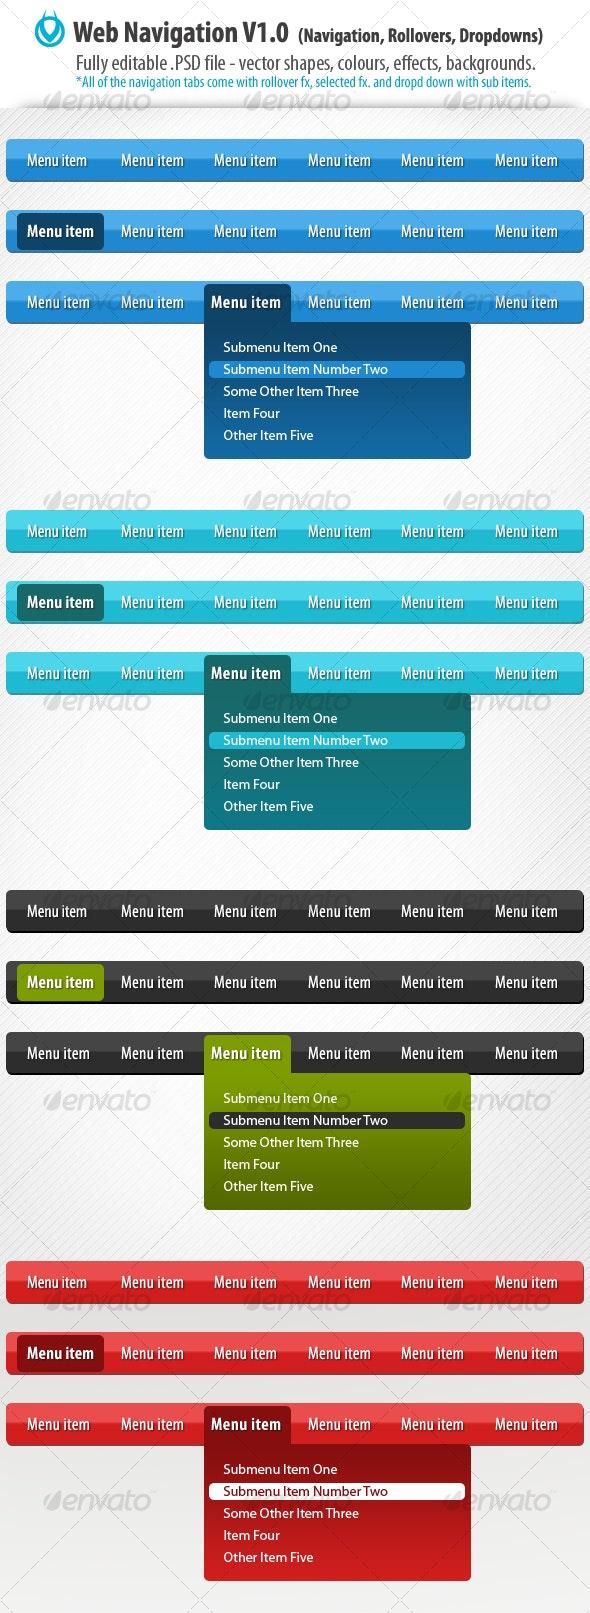 Web Navigation v1.0 by VO - Web Elements